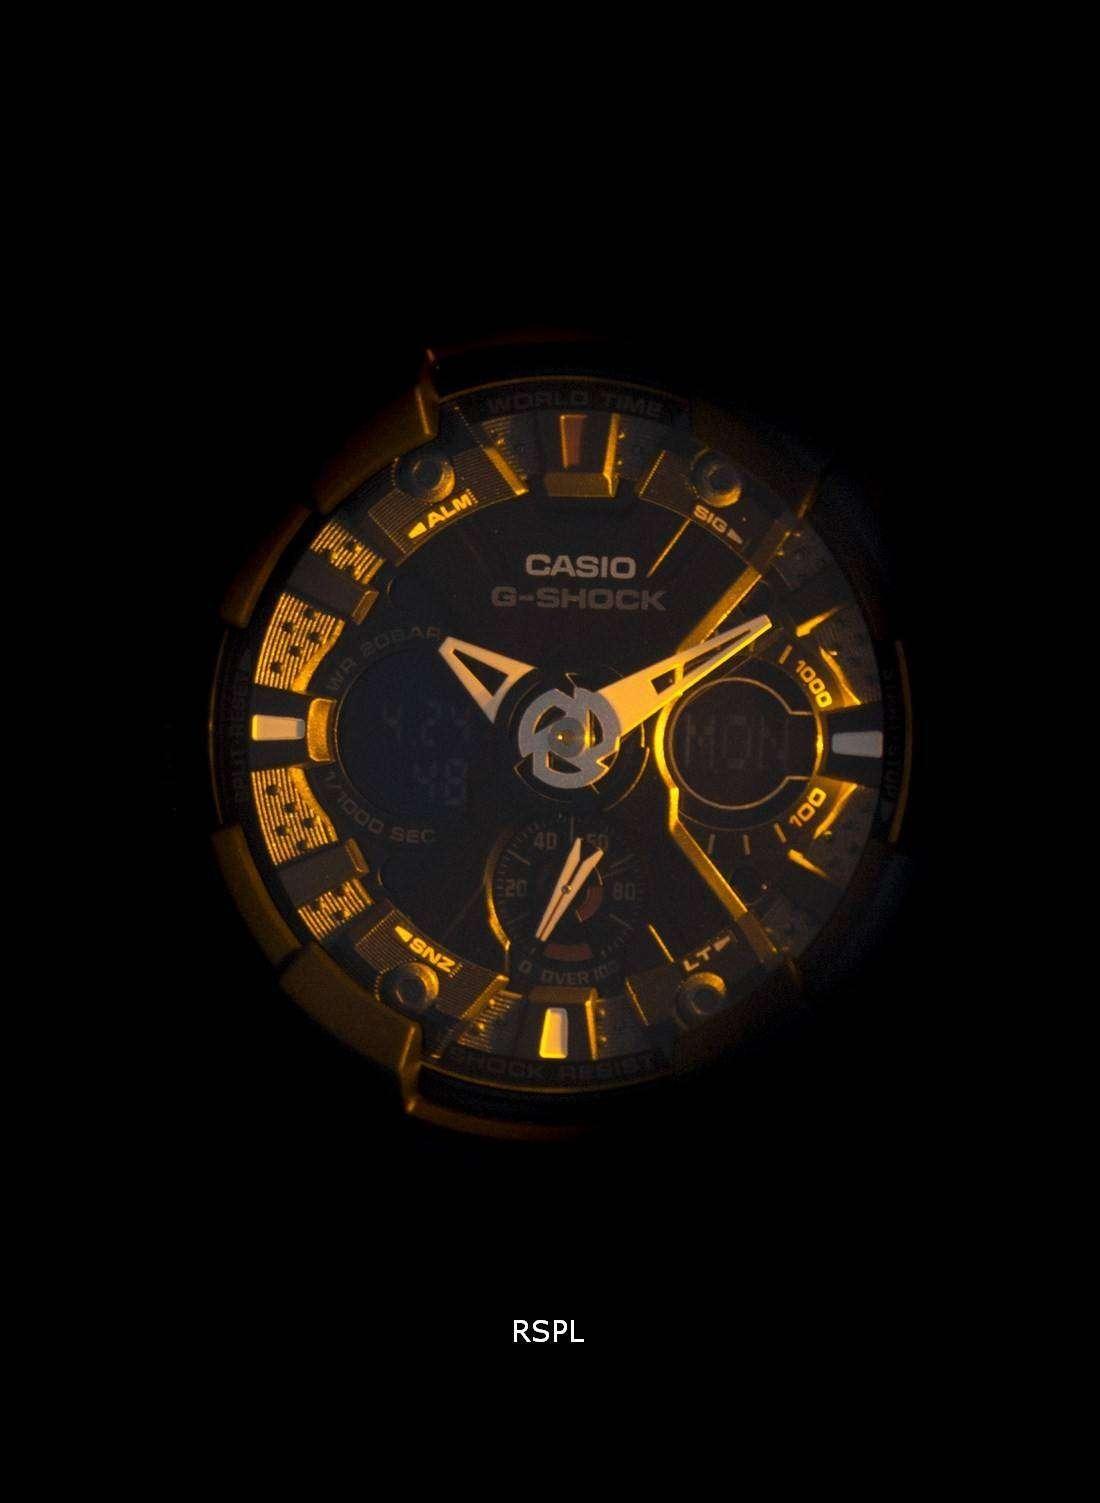 casio g shock ga 120 1a black analog digital mens watch downunderwatches. Black Bedroom Furniture Sets. Home Design Ideas